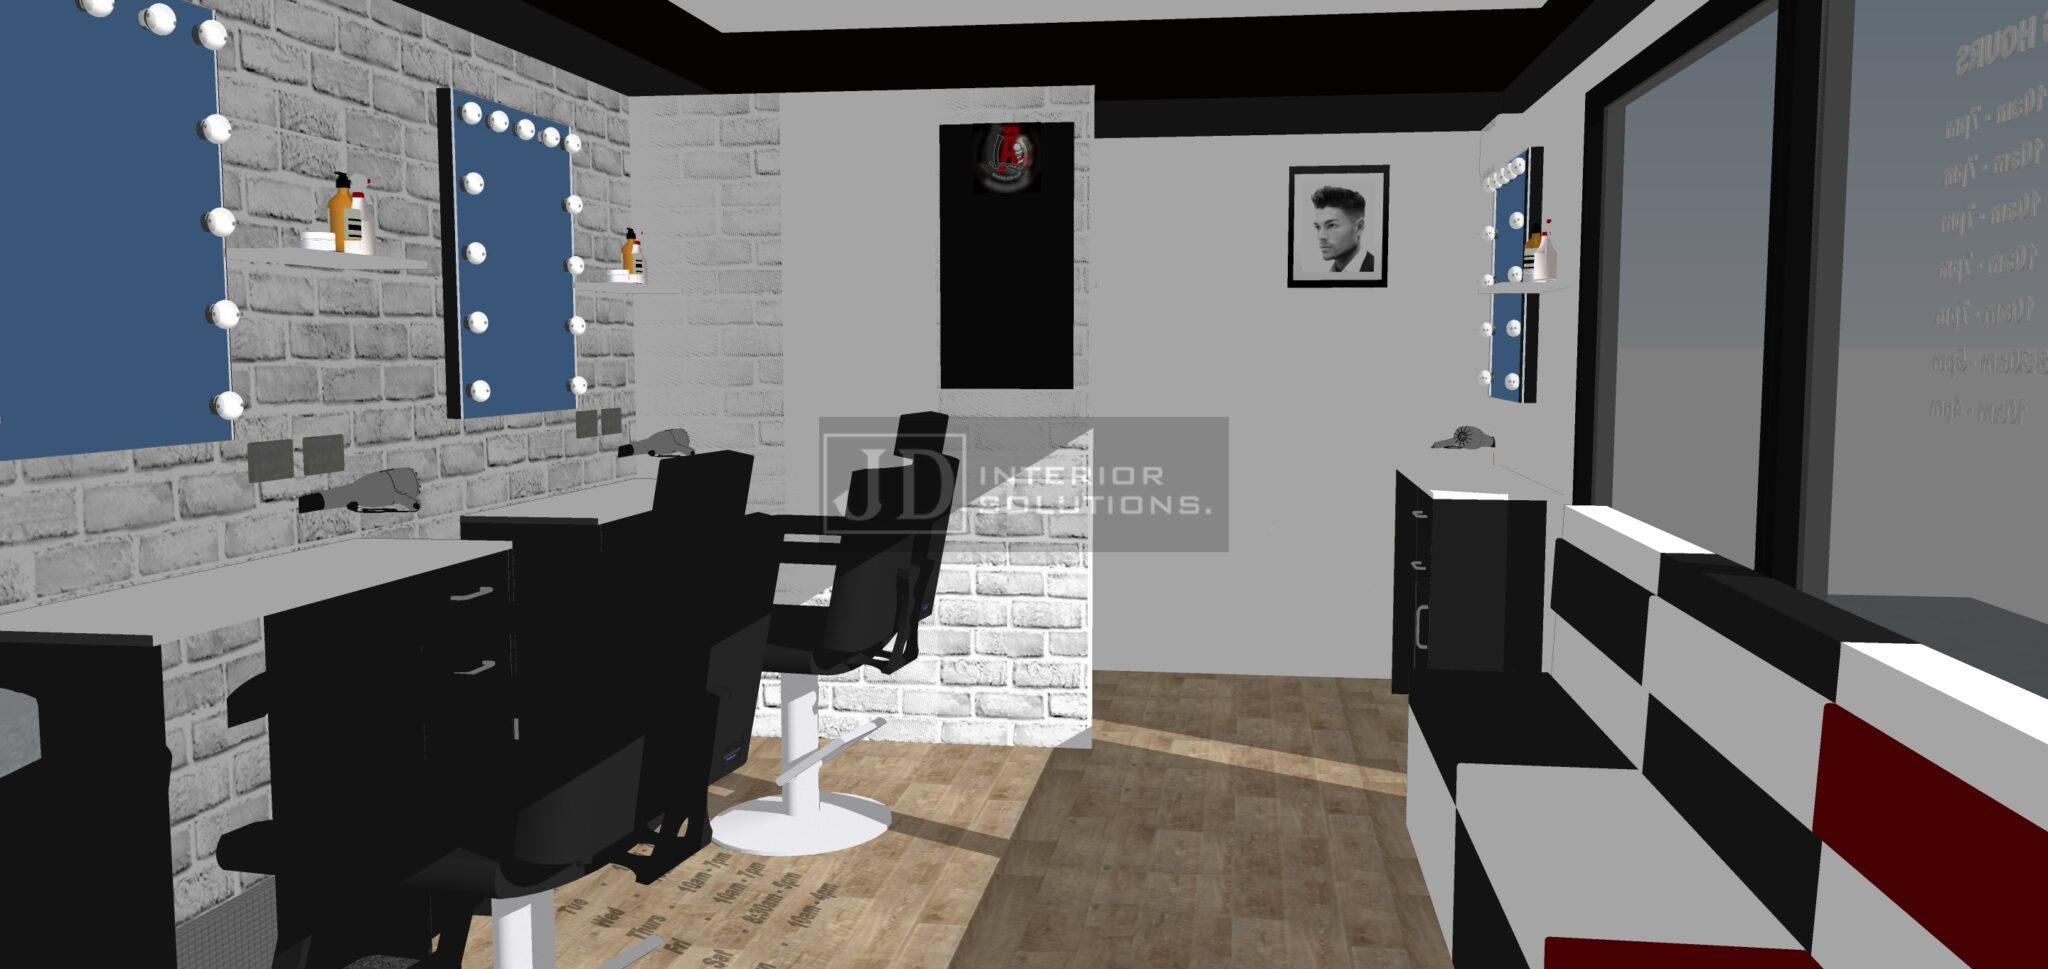 LA Jaks Barbershop - 6.8m x 3.4m2